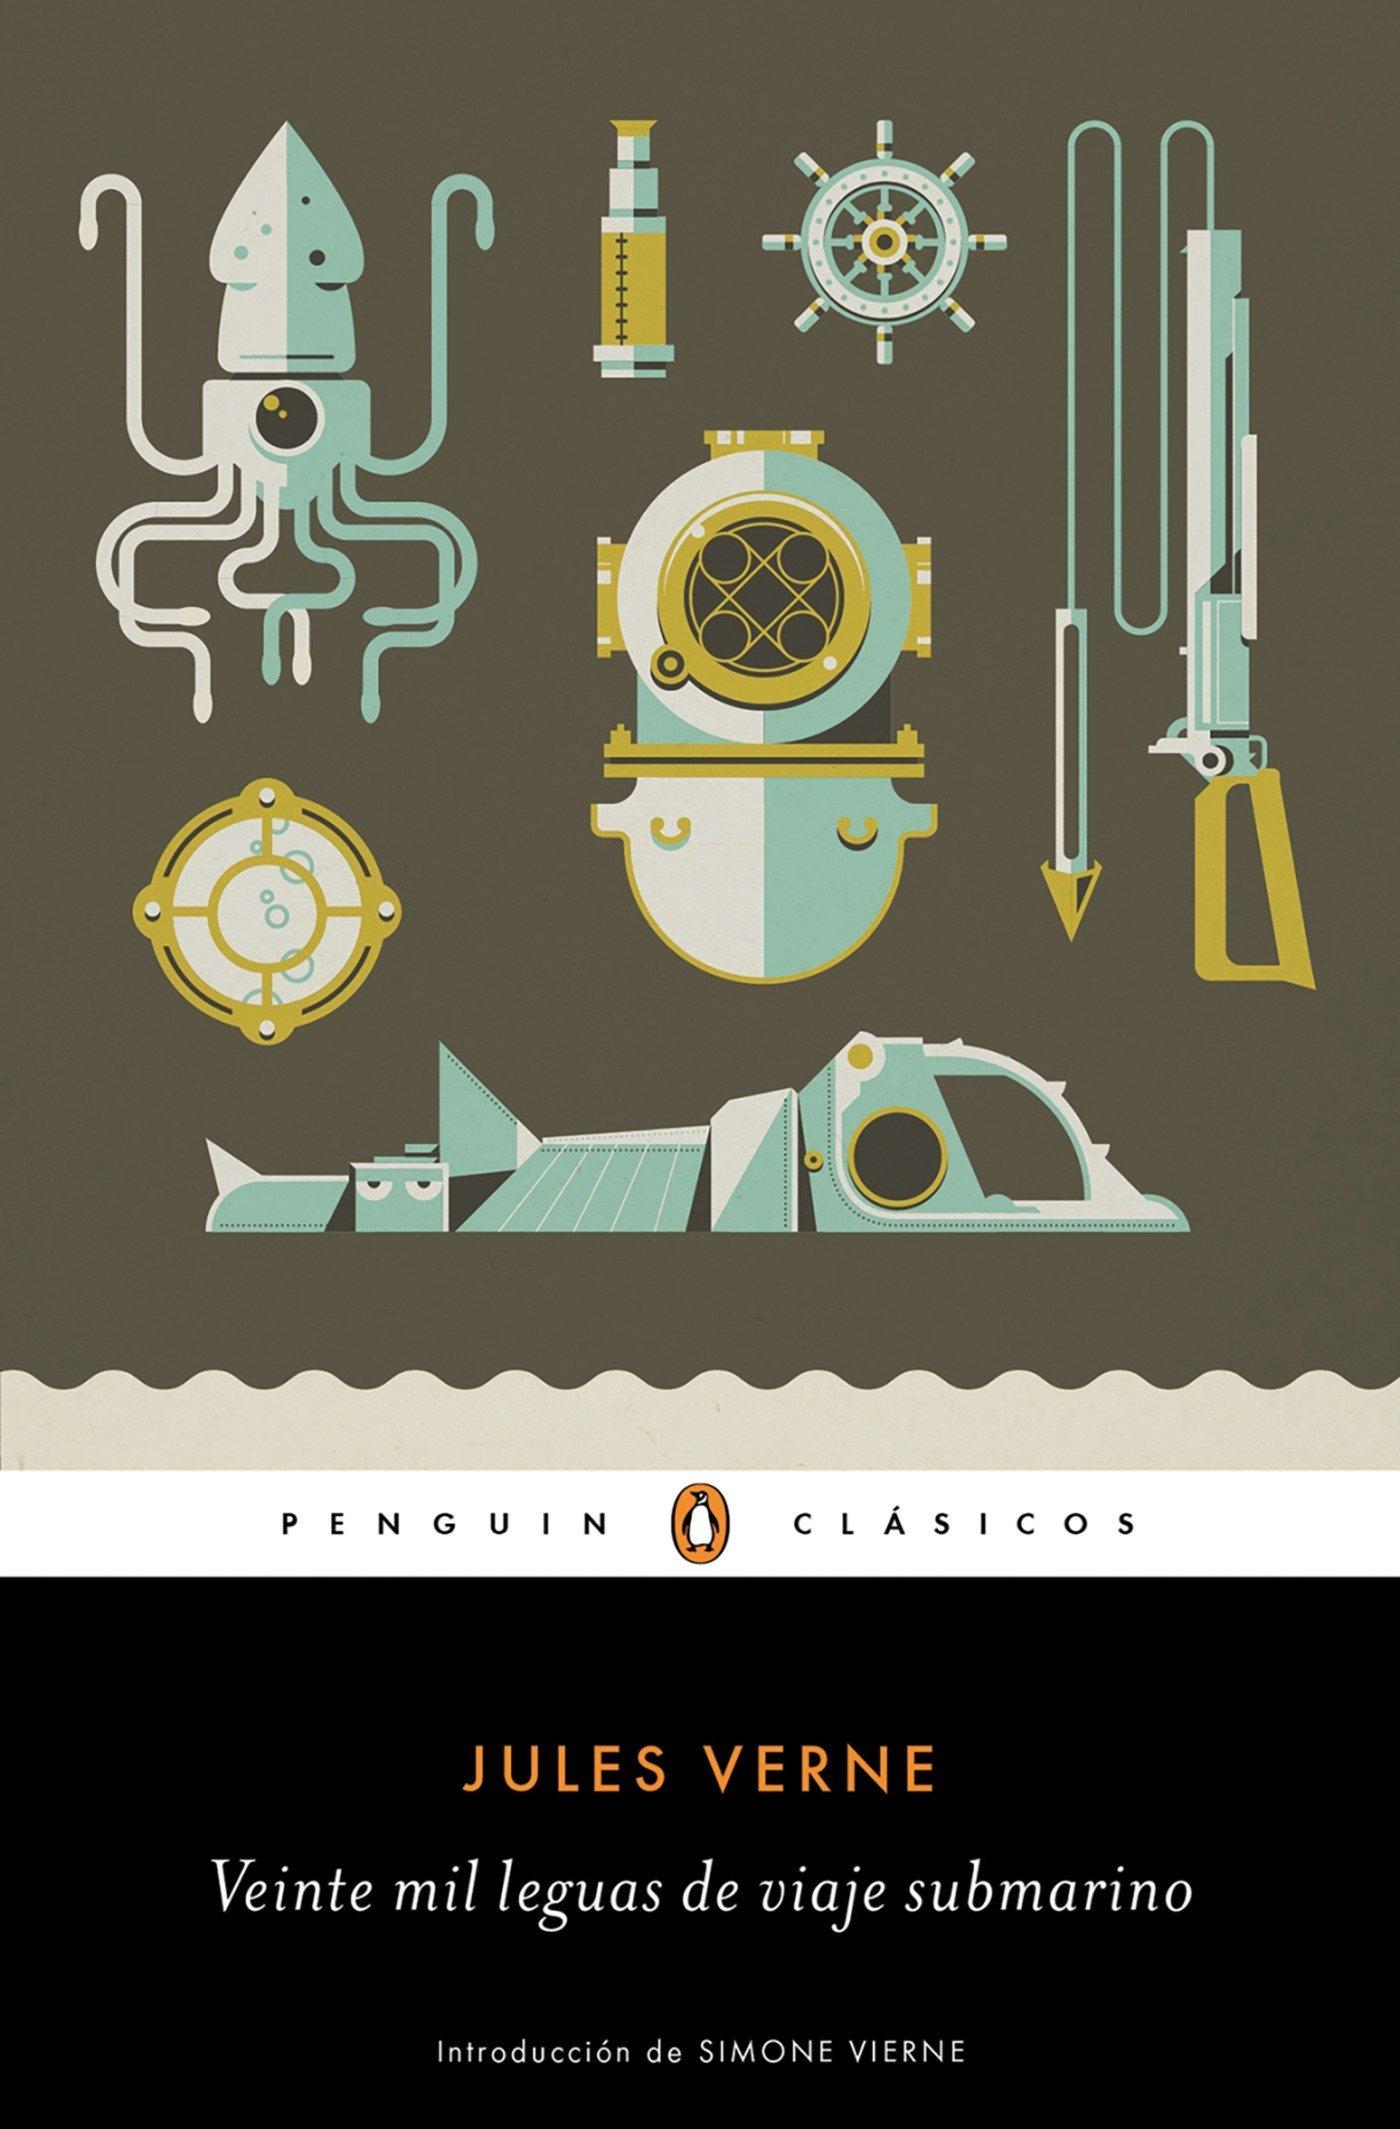 Veinte mil leguas de viaje submarino (PENGUIN CLÁSICOS) Tapa blanda – 21 jun 2018 Jules Verne JOFRE;PASCUAL ANTONIO; HOMEDES BEUTNAGEL PENGUIN CLASICOS